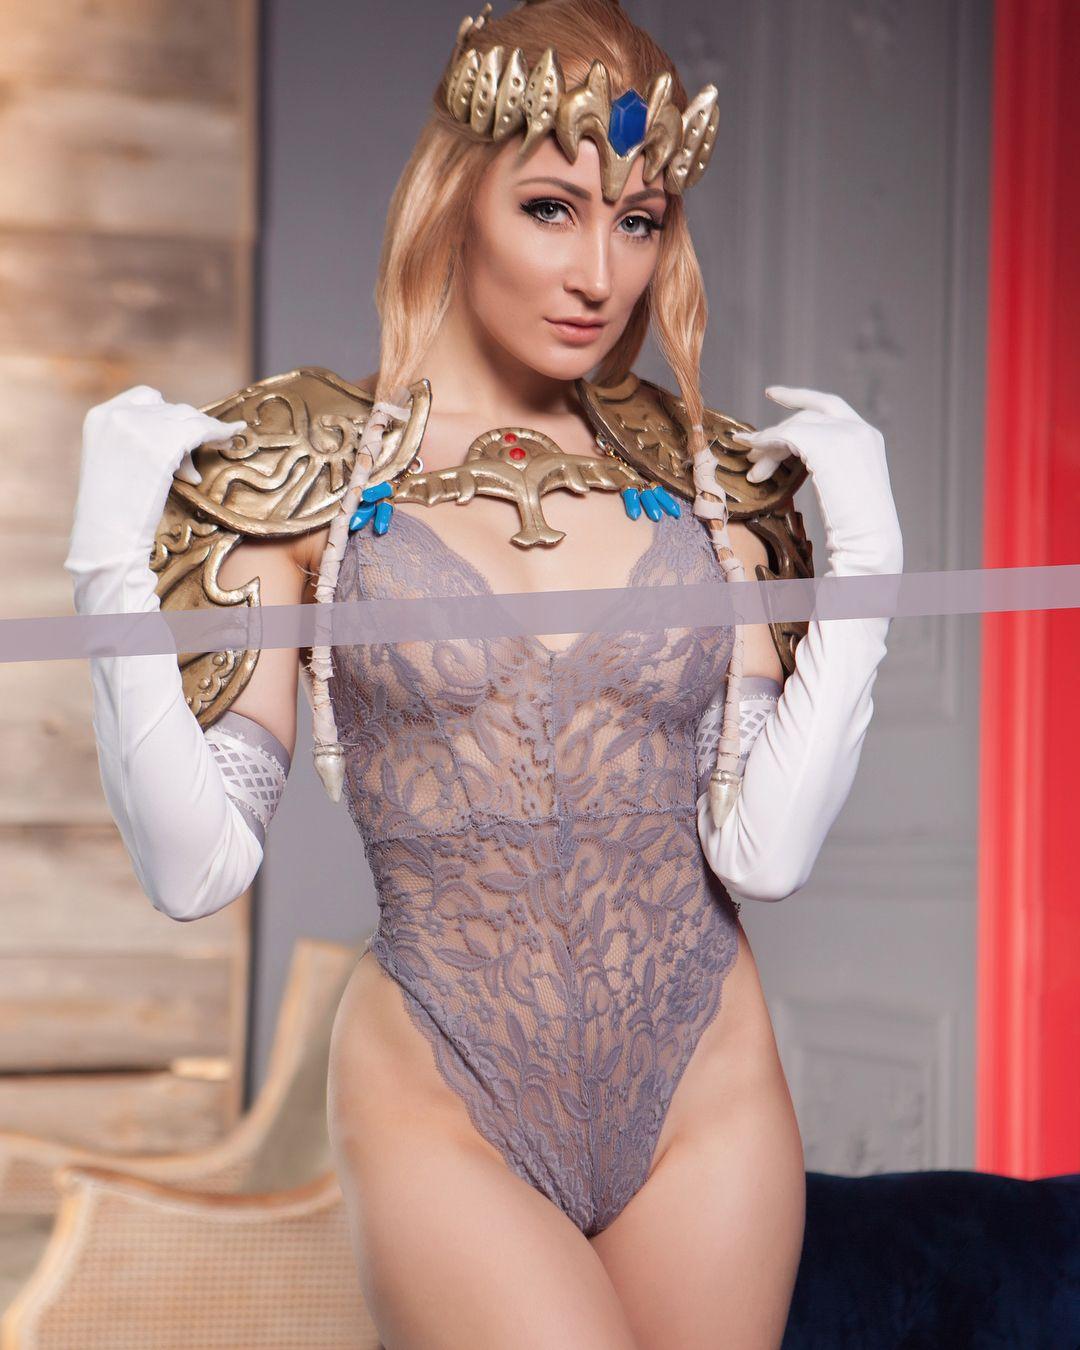 Size kk naked tits